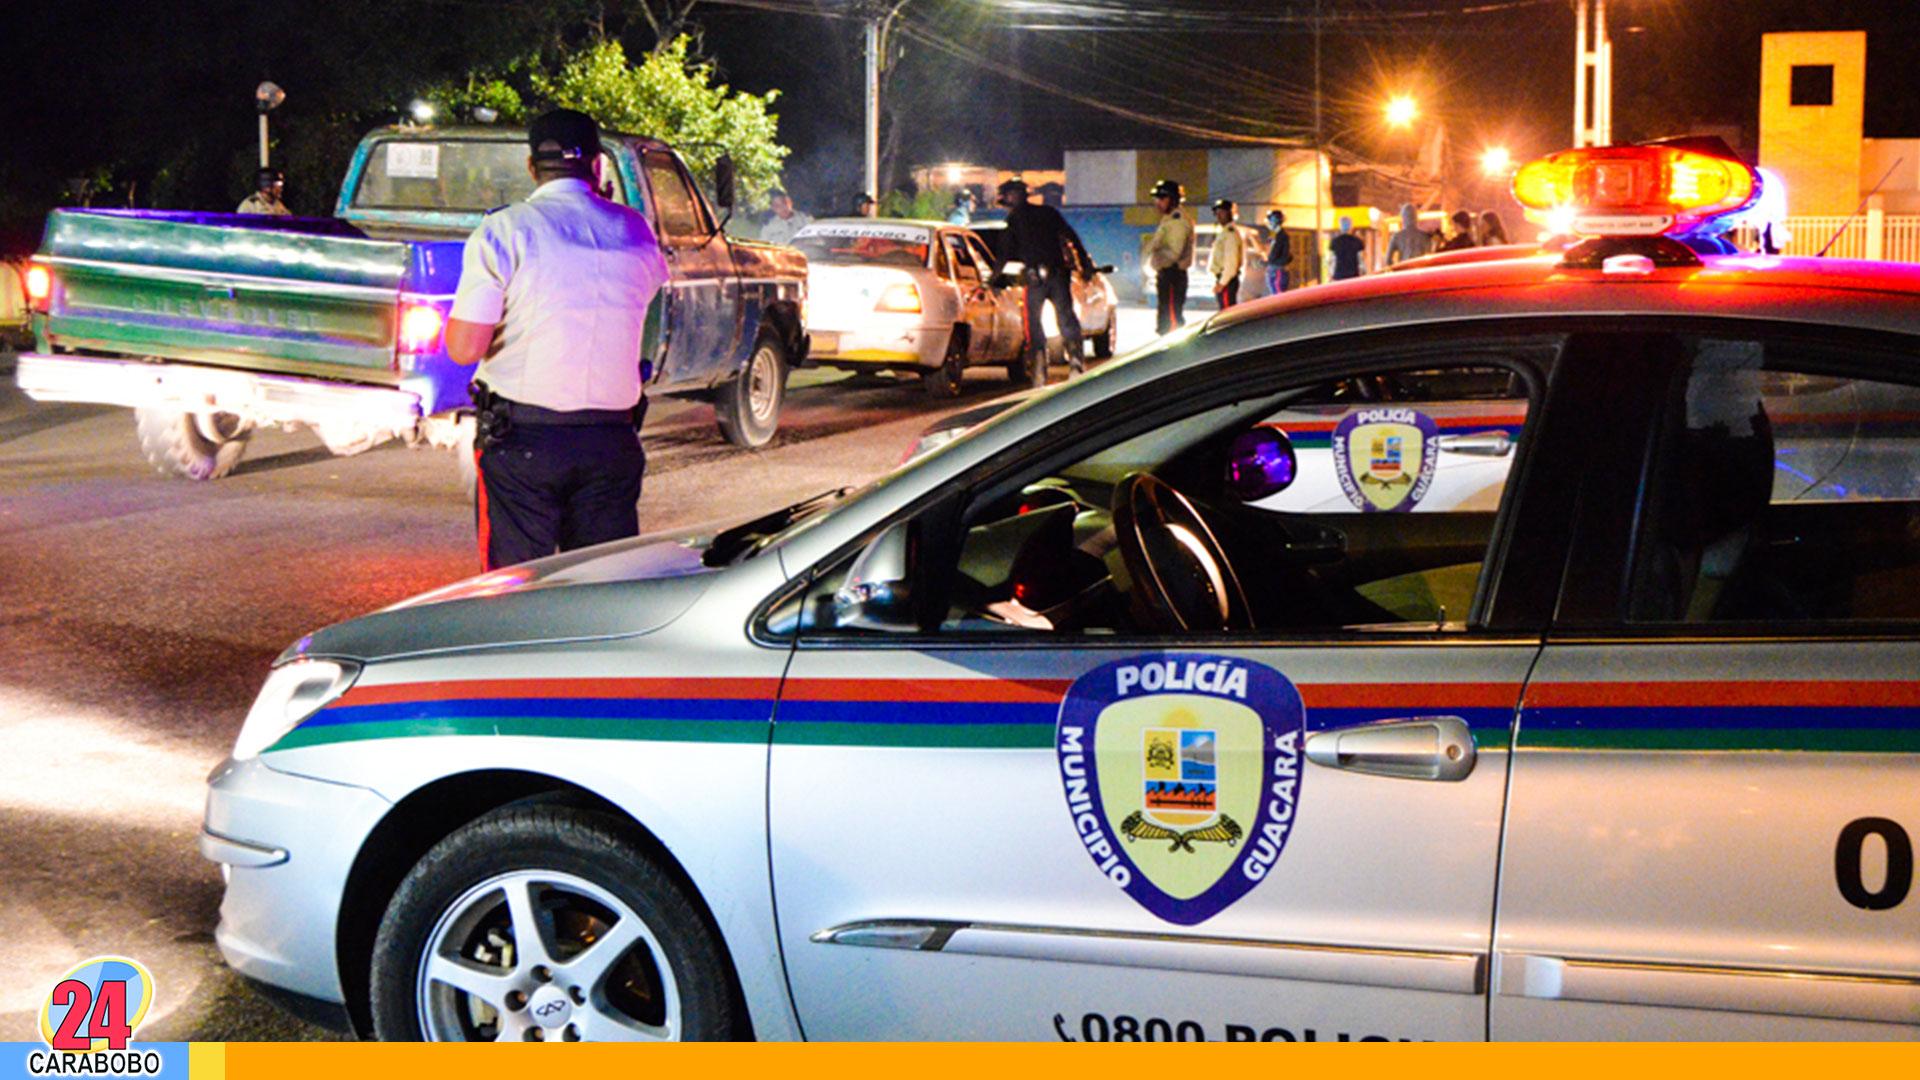 Policía de Guacara- noticias 24 carabobo